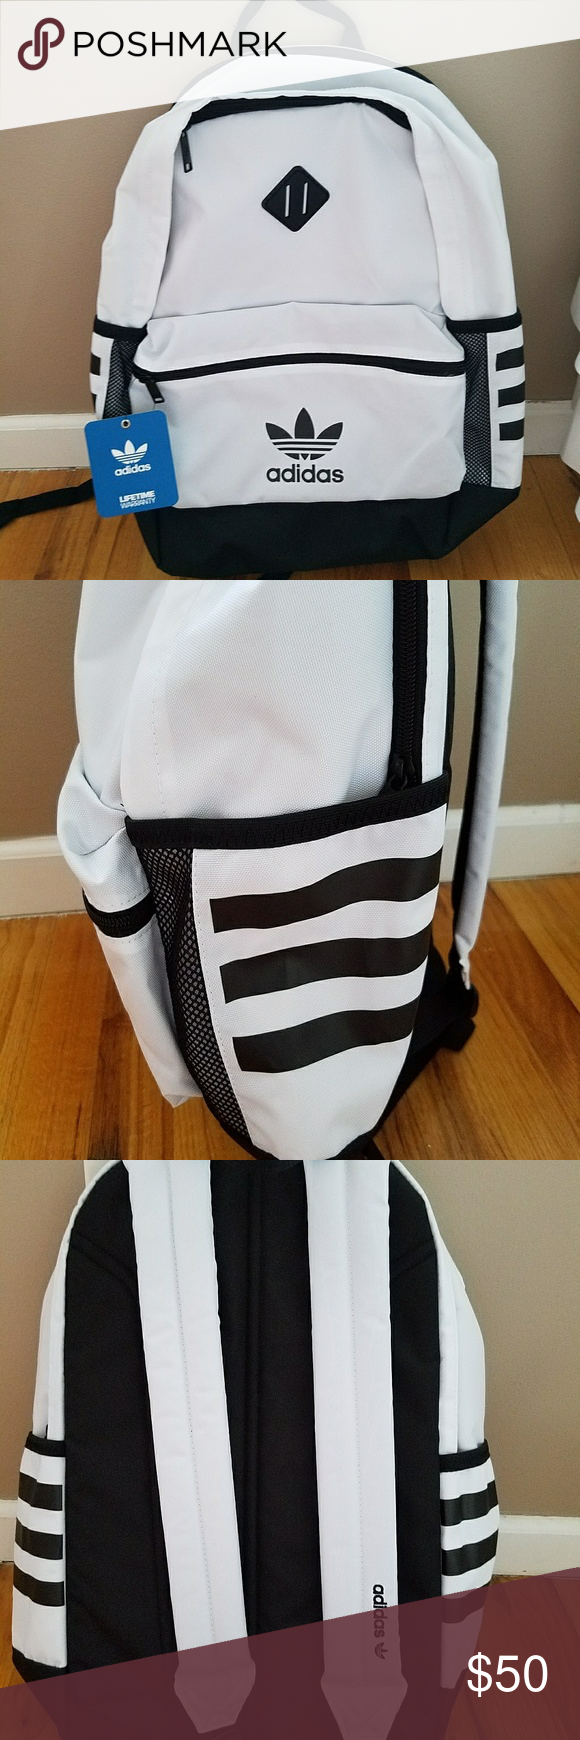 adidas originals base backpack